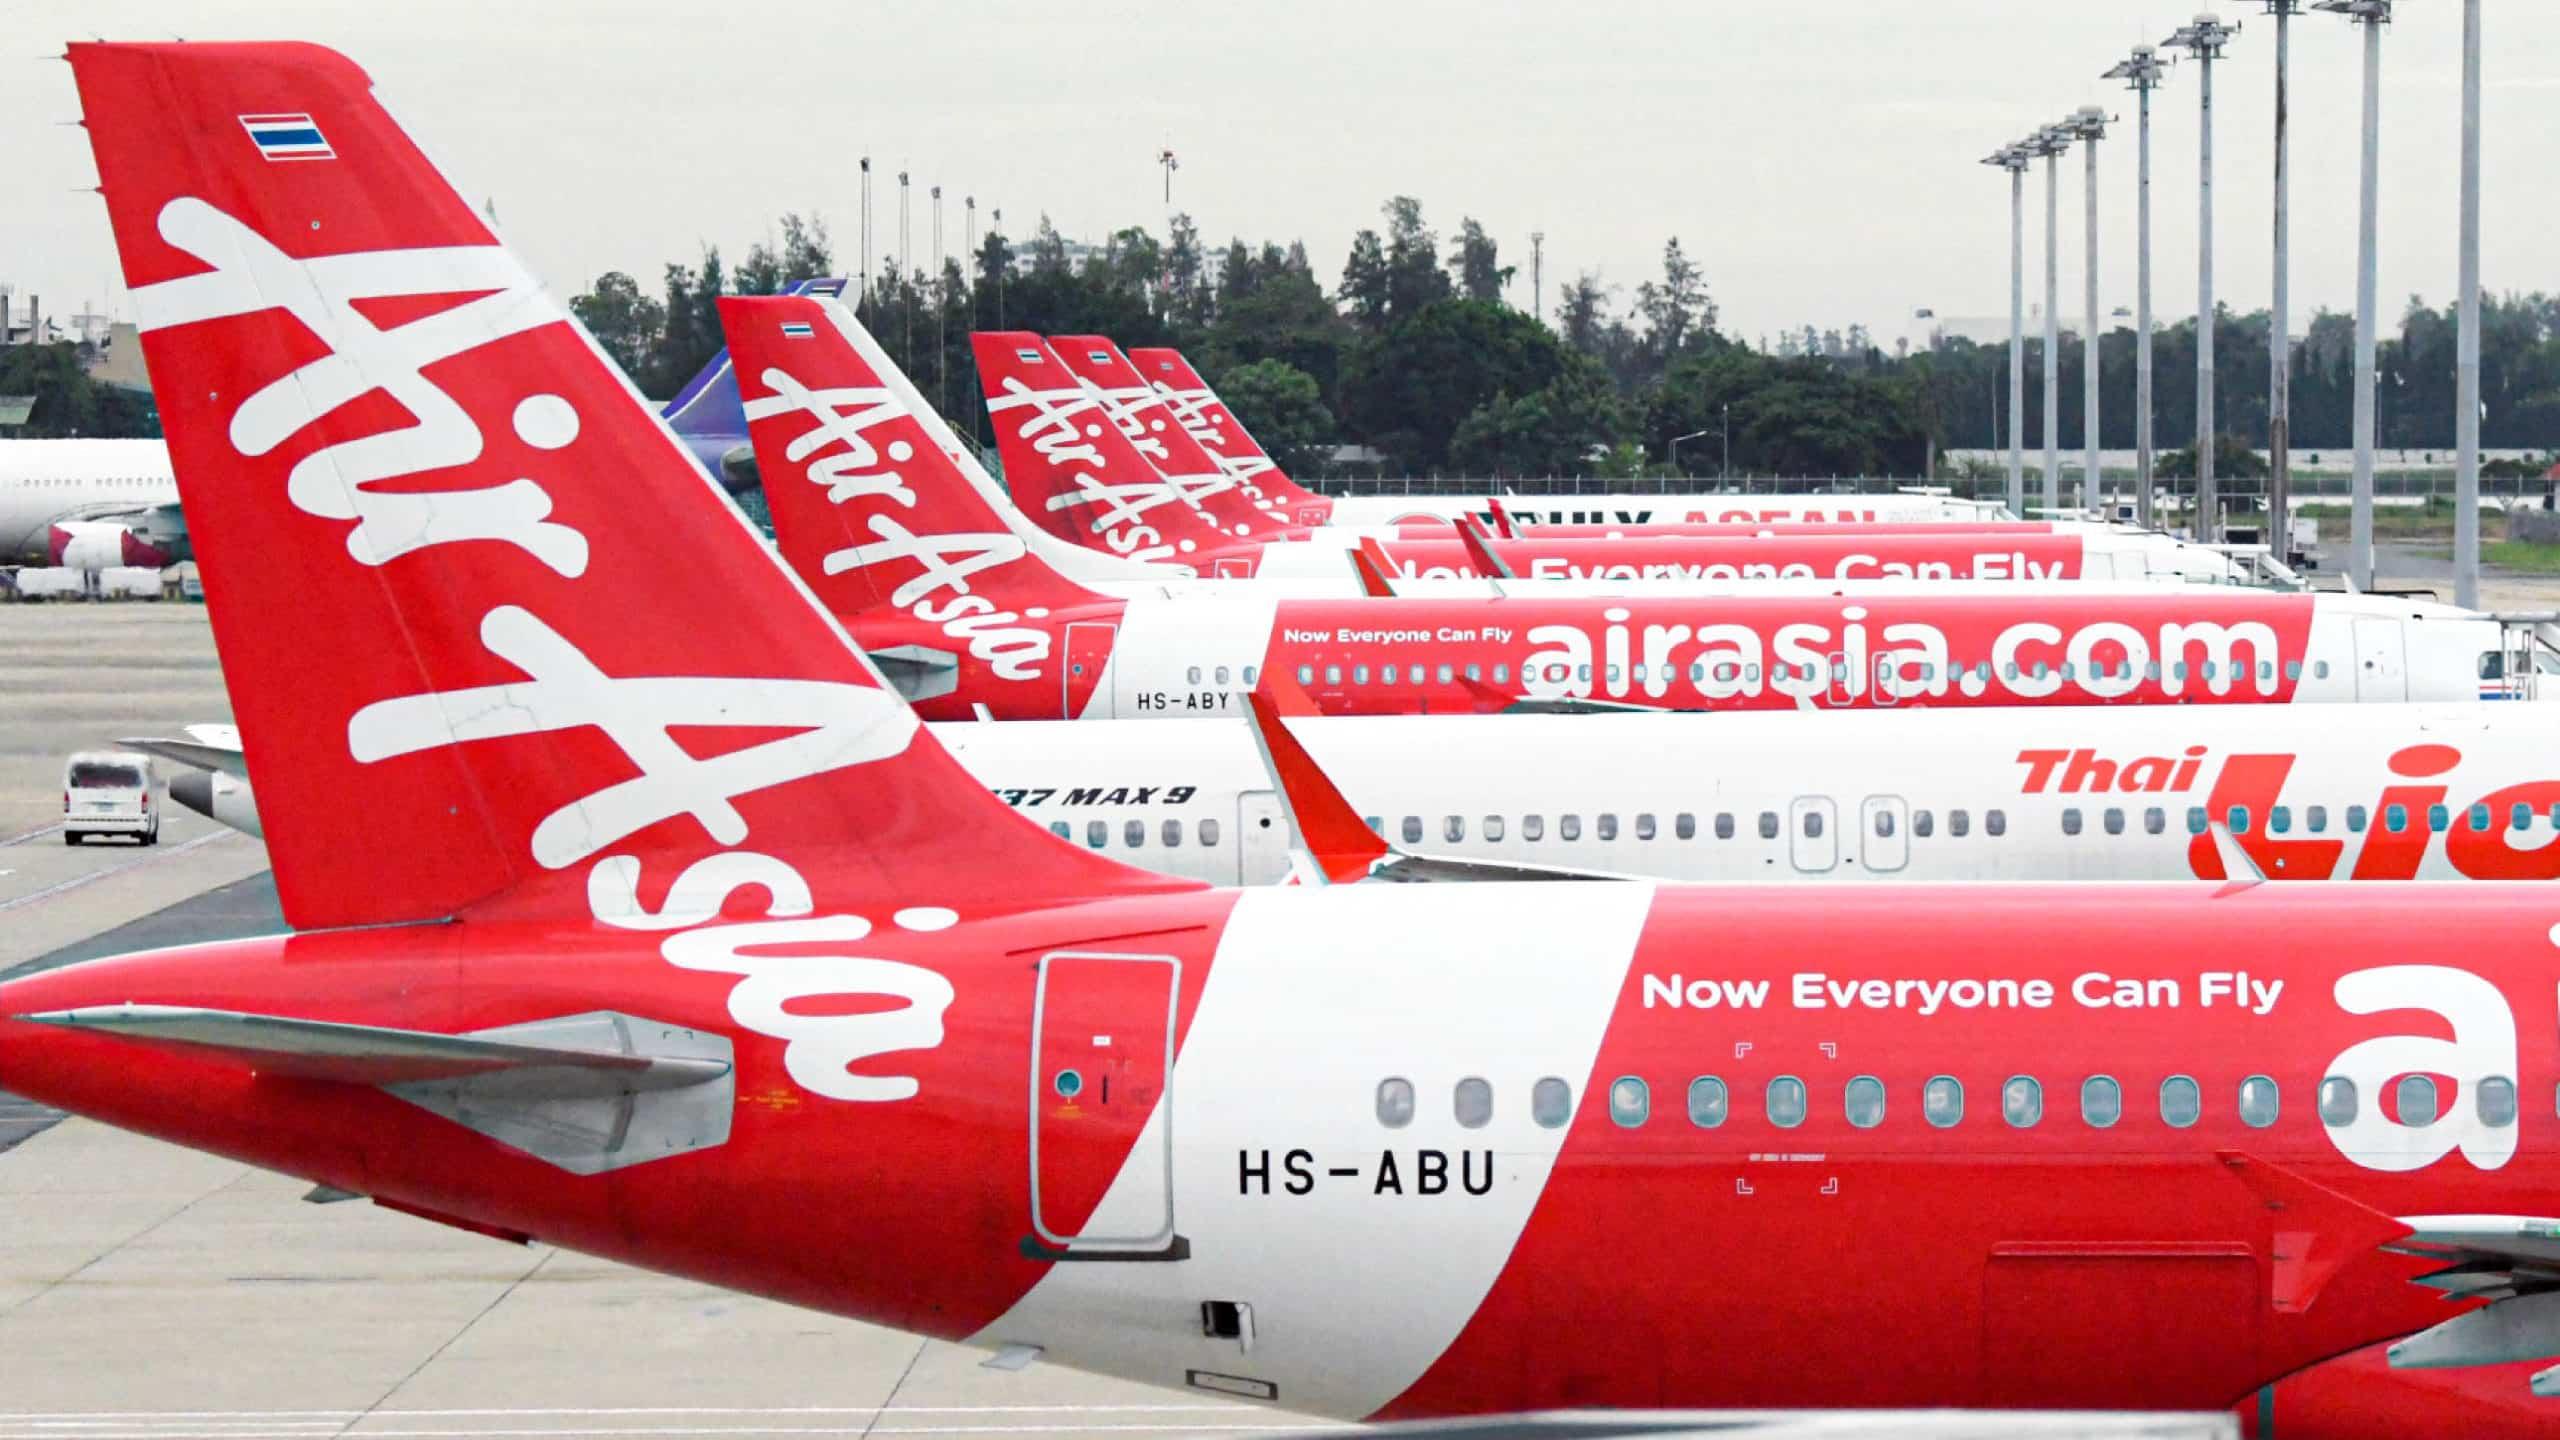 Kerajaan lulus pinjaman RM1 bilion kepada Air Asia, lapor media